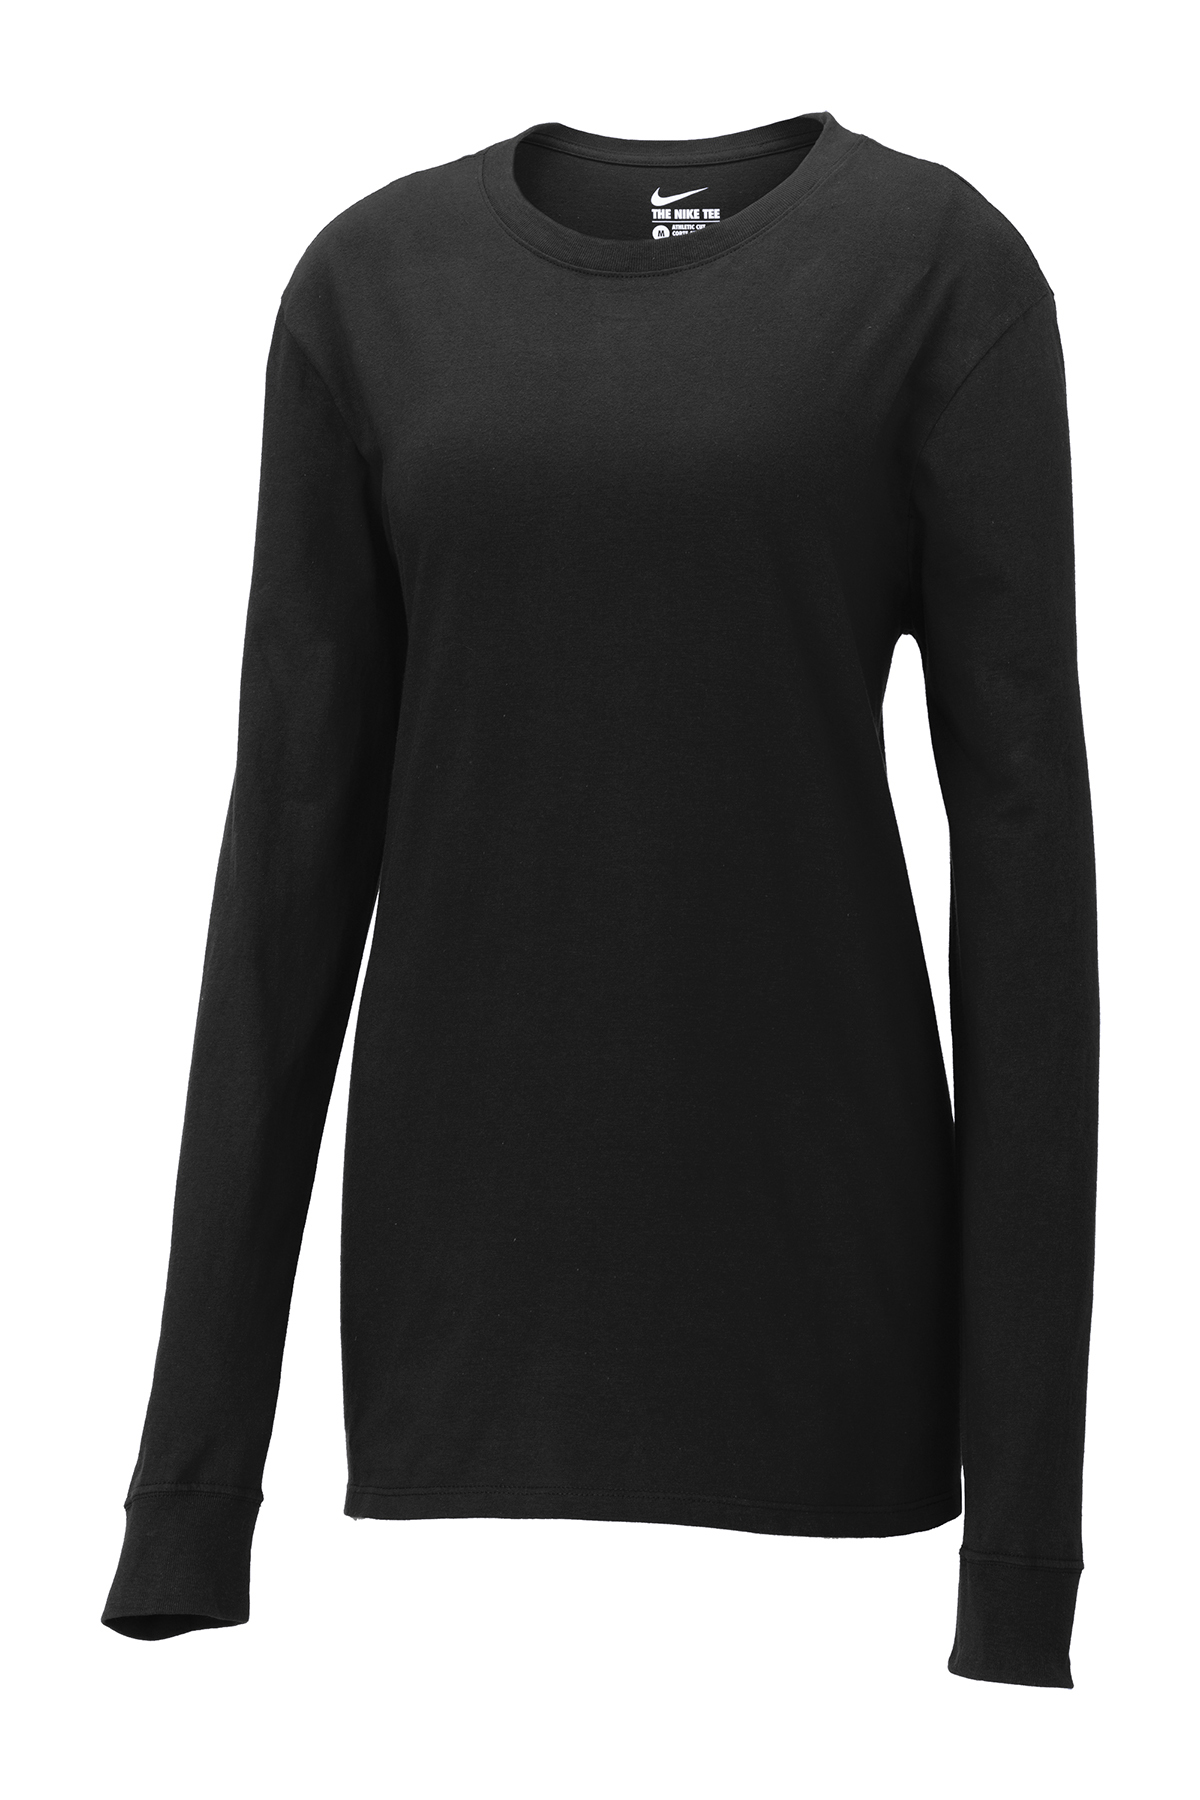 Nike Golf NKCD7300 - Ladies Core Cotton Long Sleeve ...